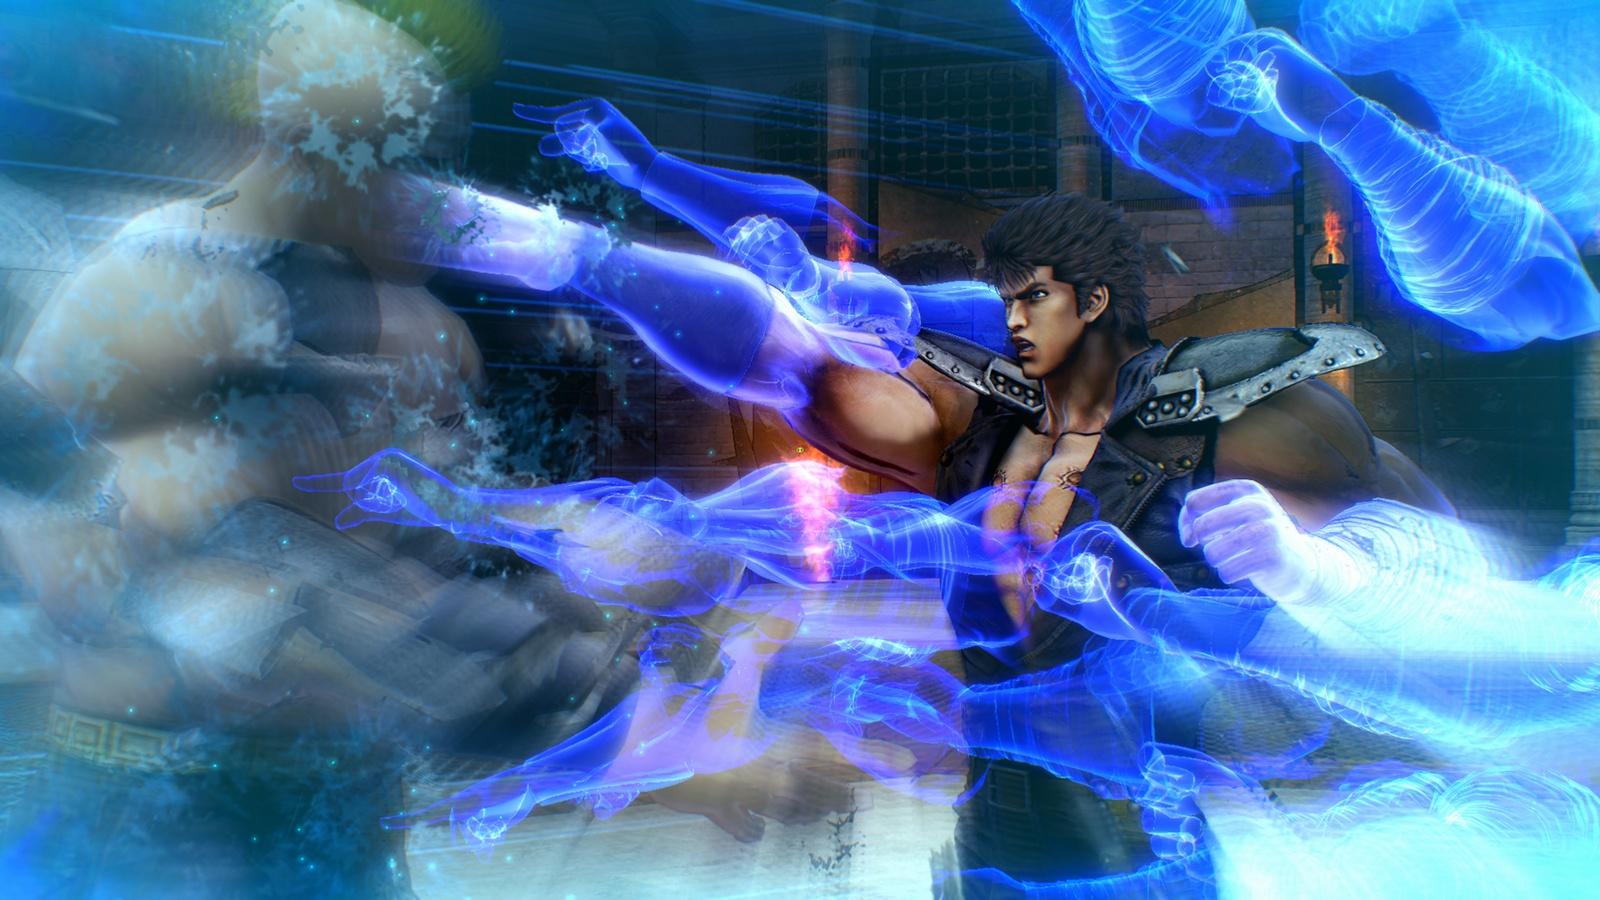 Yakuza team making Fist of the North Star action game screenshot